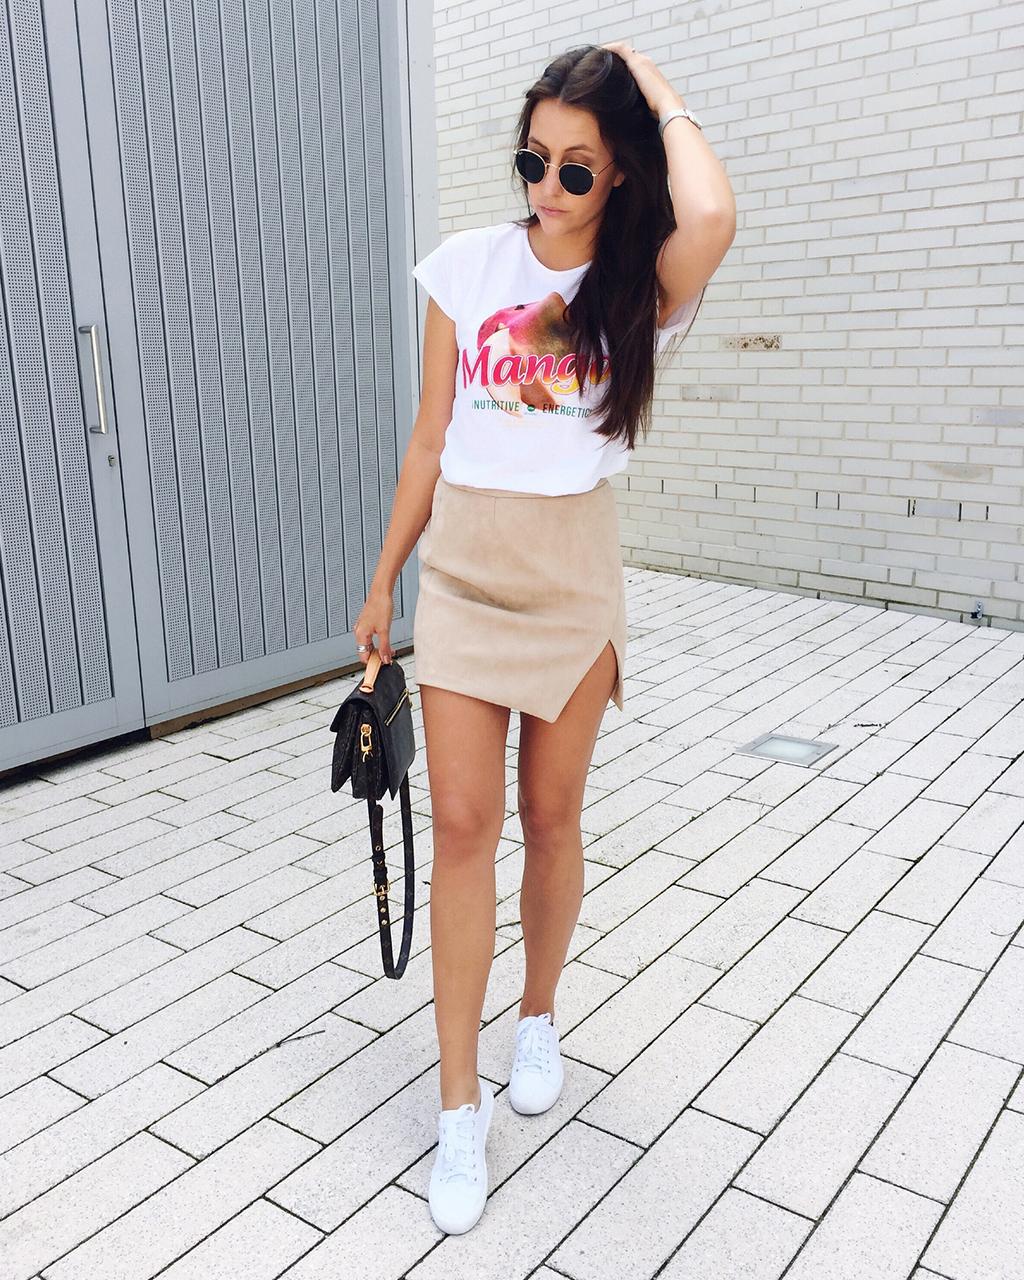 Wildlederrock Outfit Inspiration